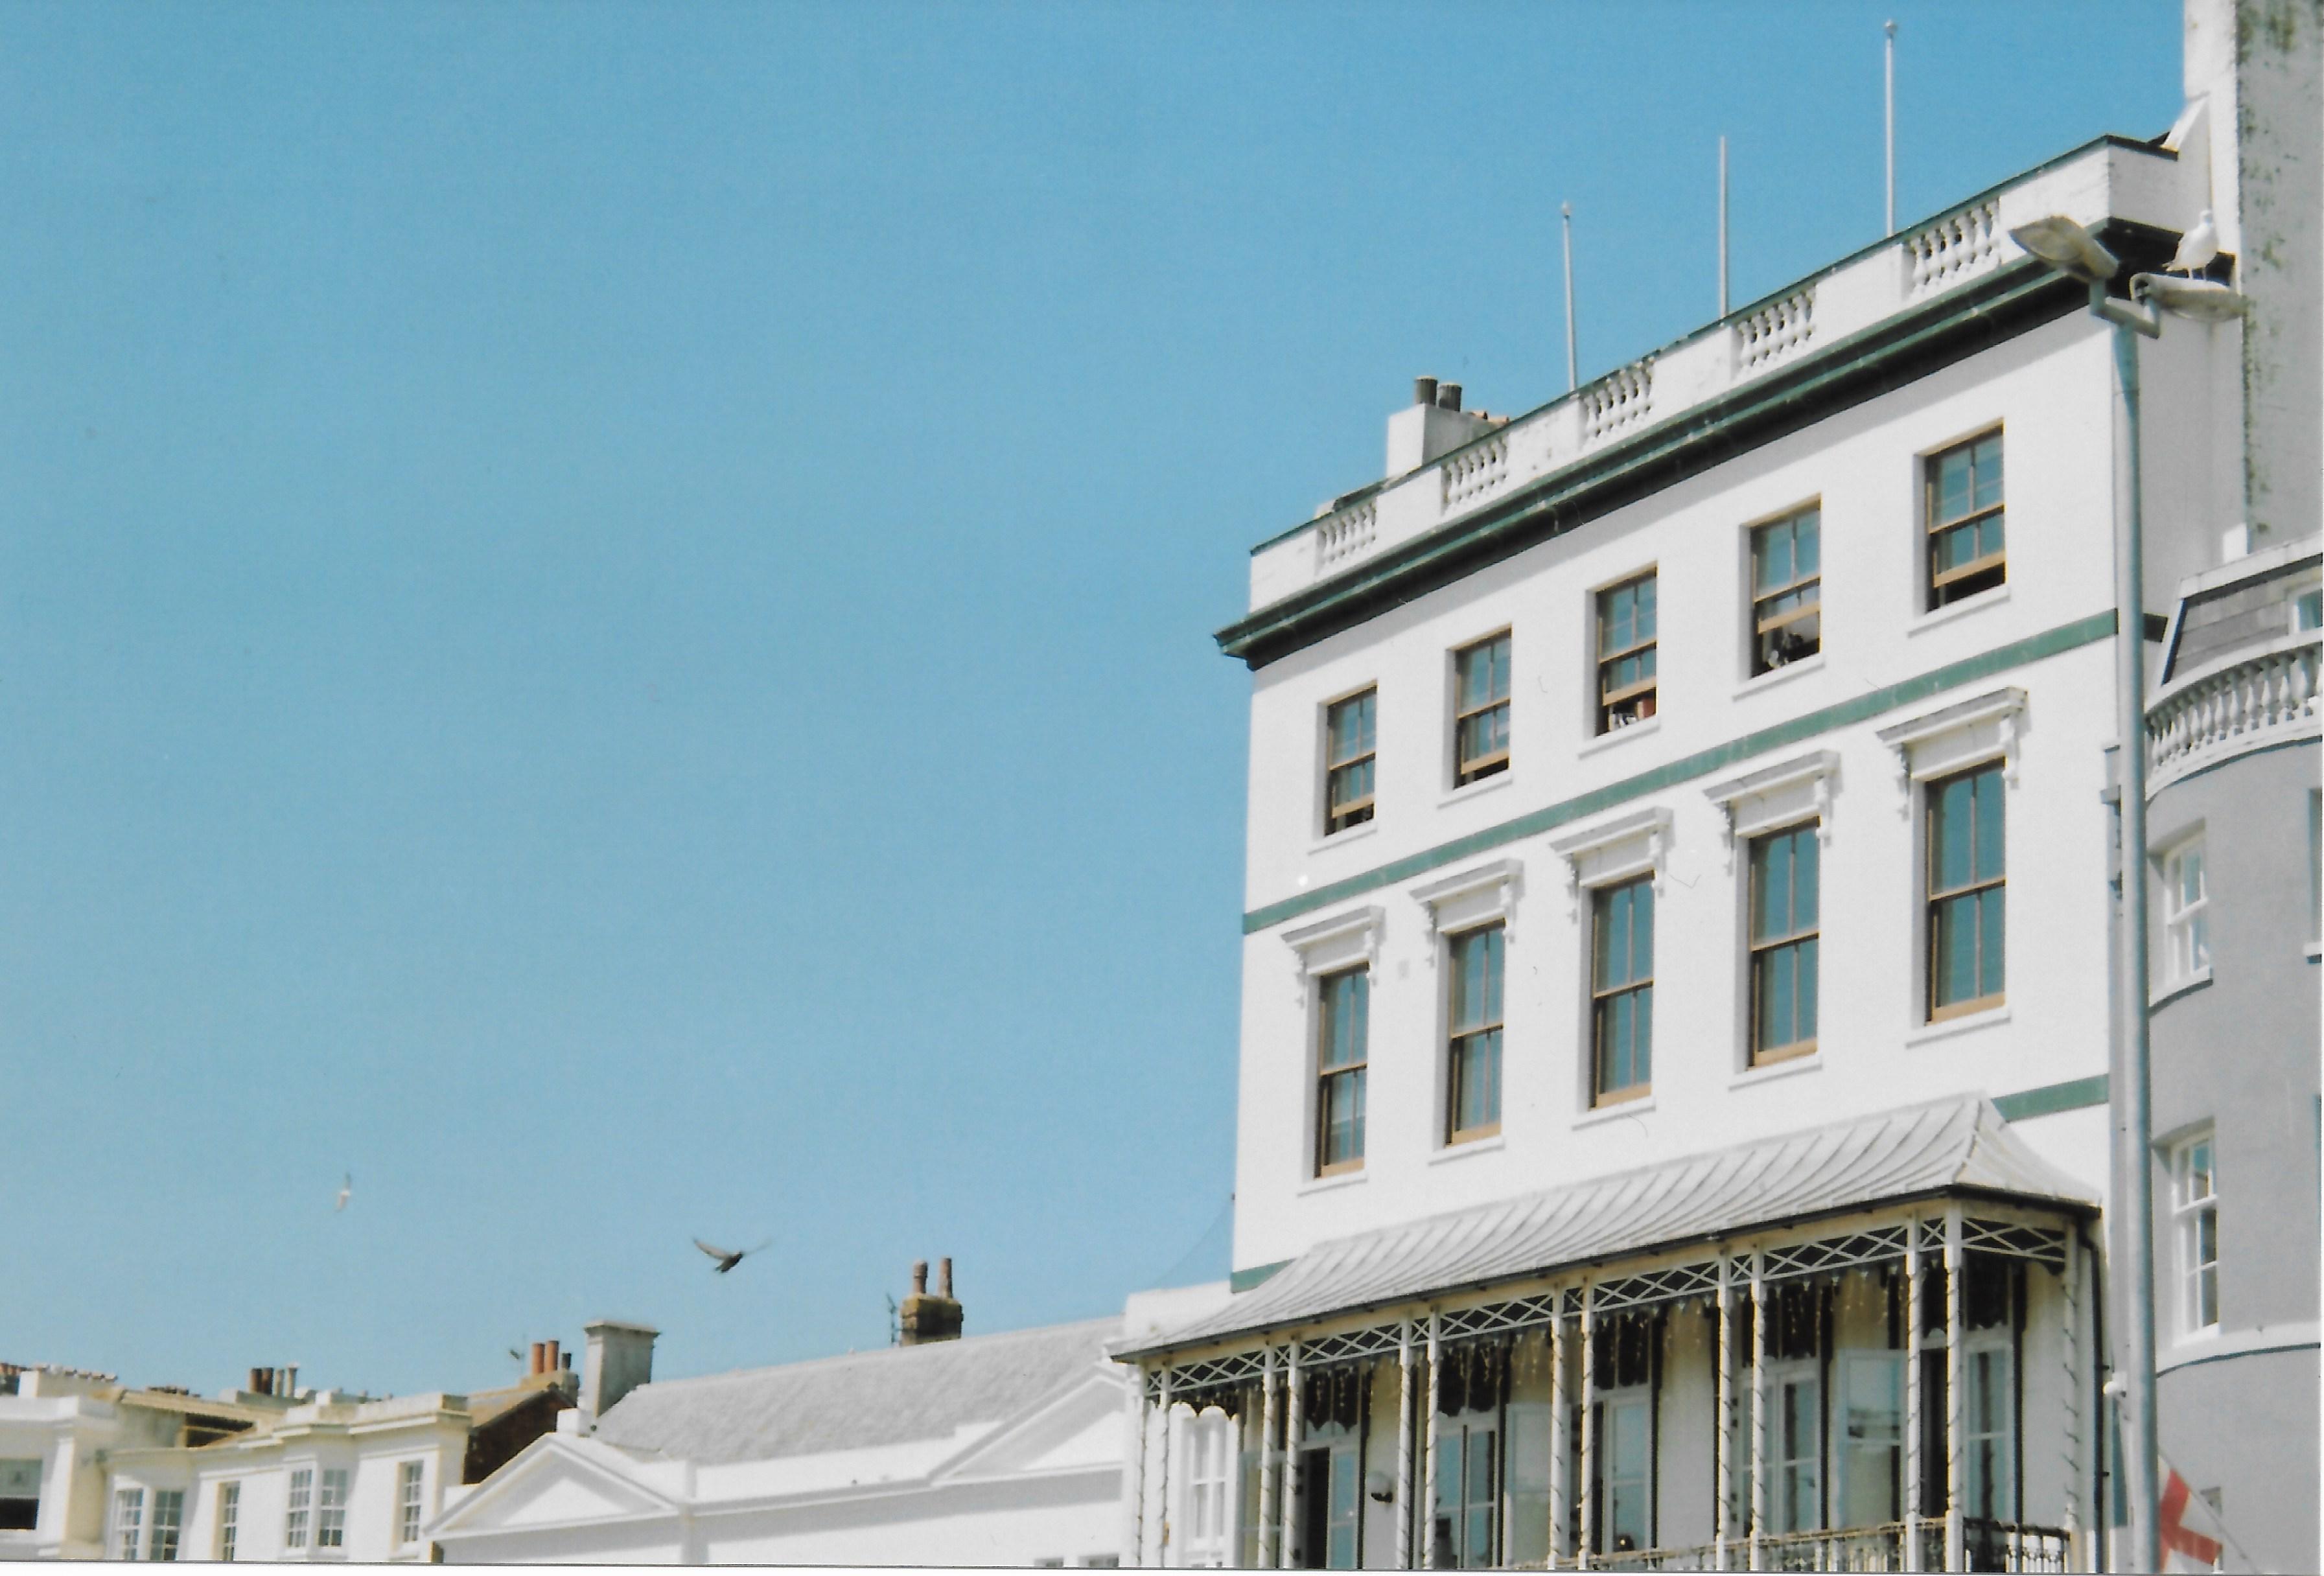 Daytime in Brighton